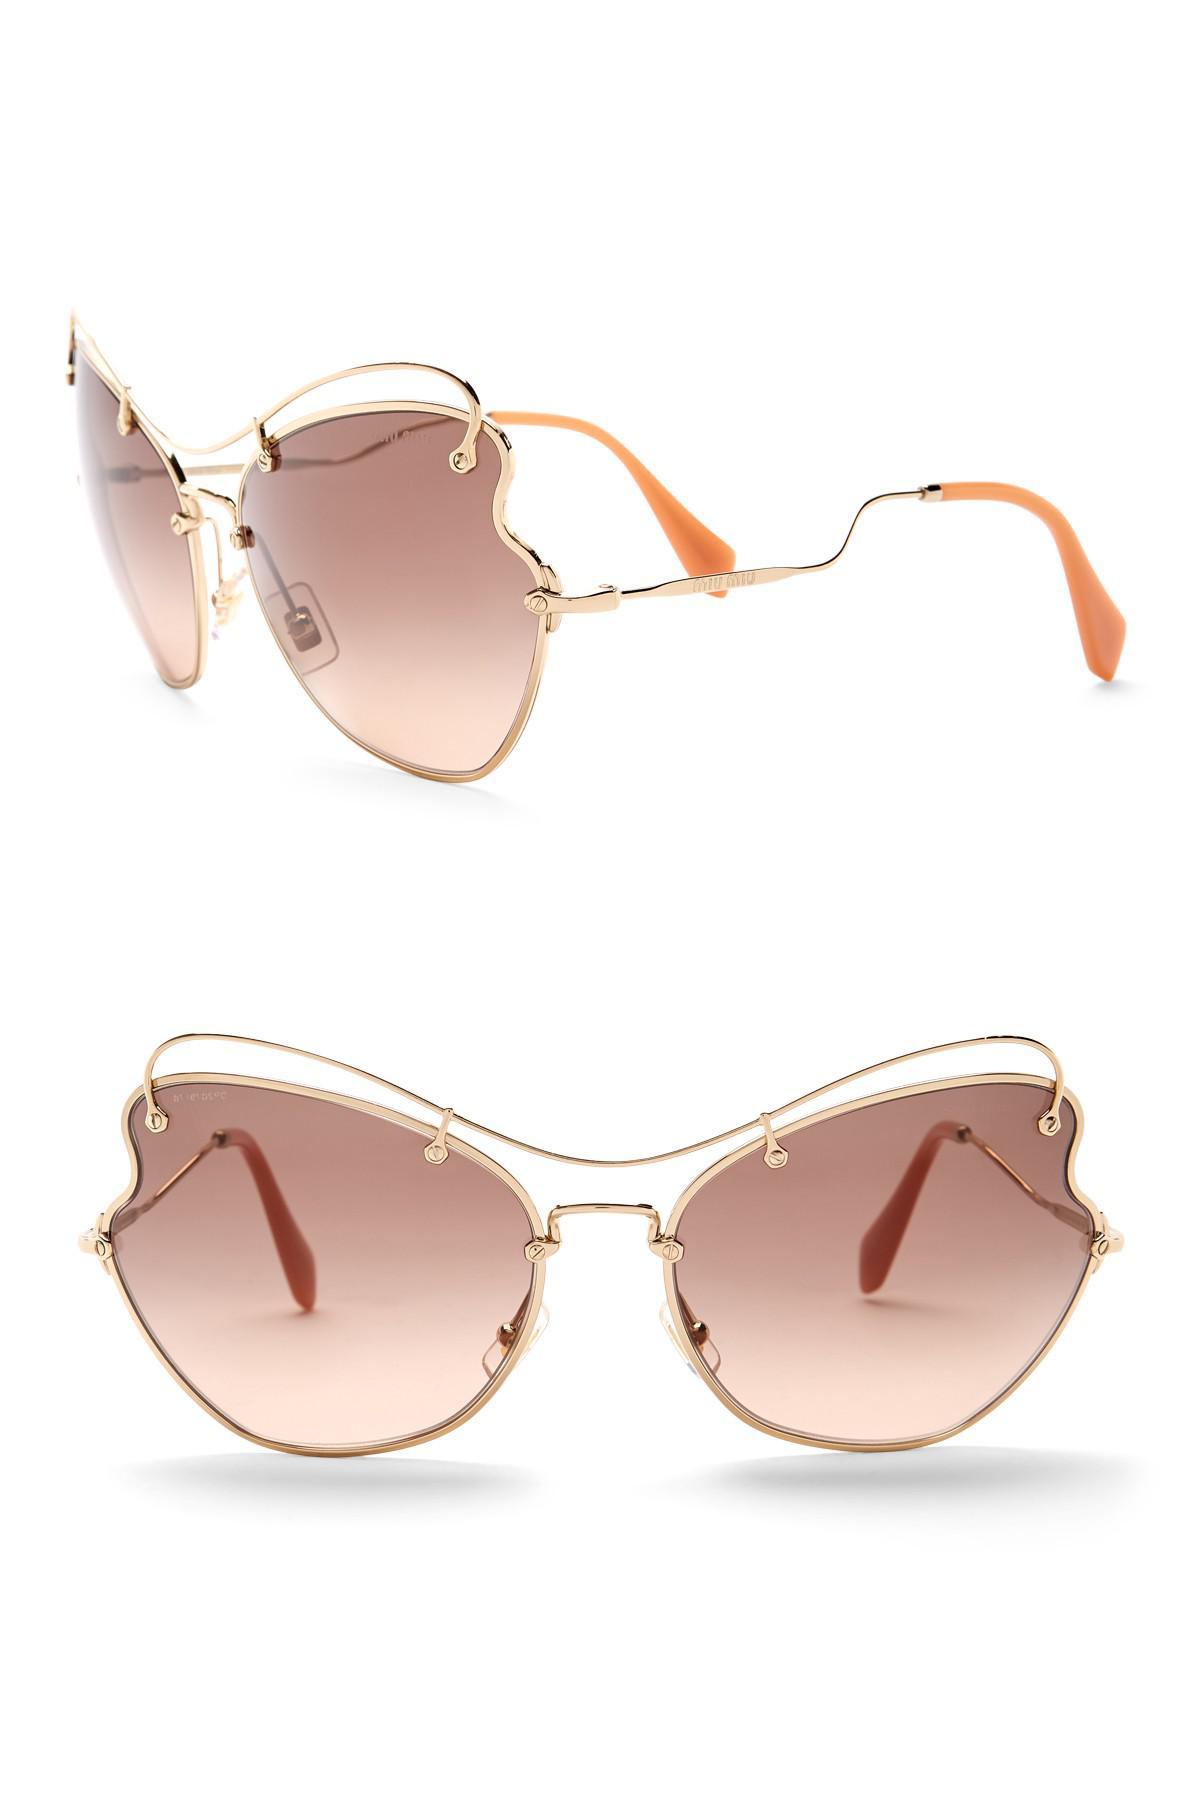 2811425a80 Miu Miu Butterfly 65mm Metal Frame Sunglasses in Brown - Lyst